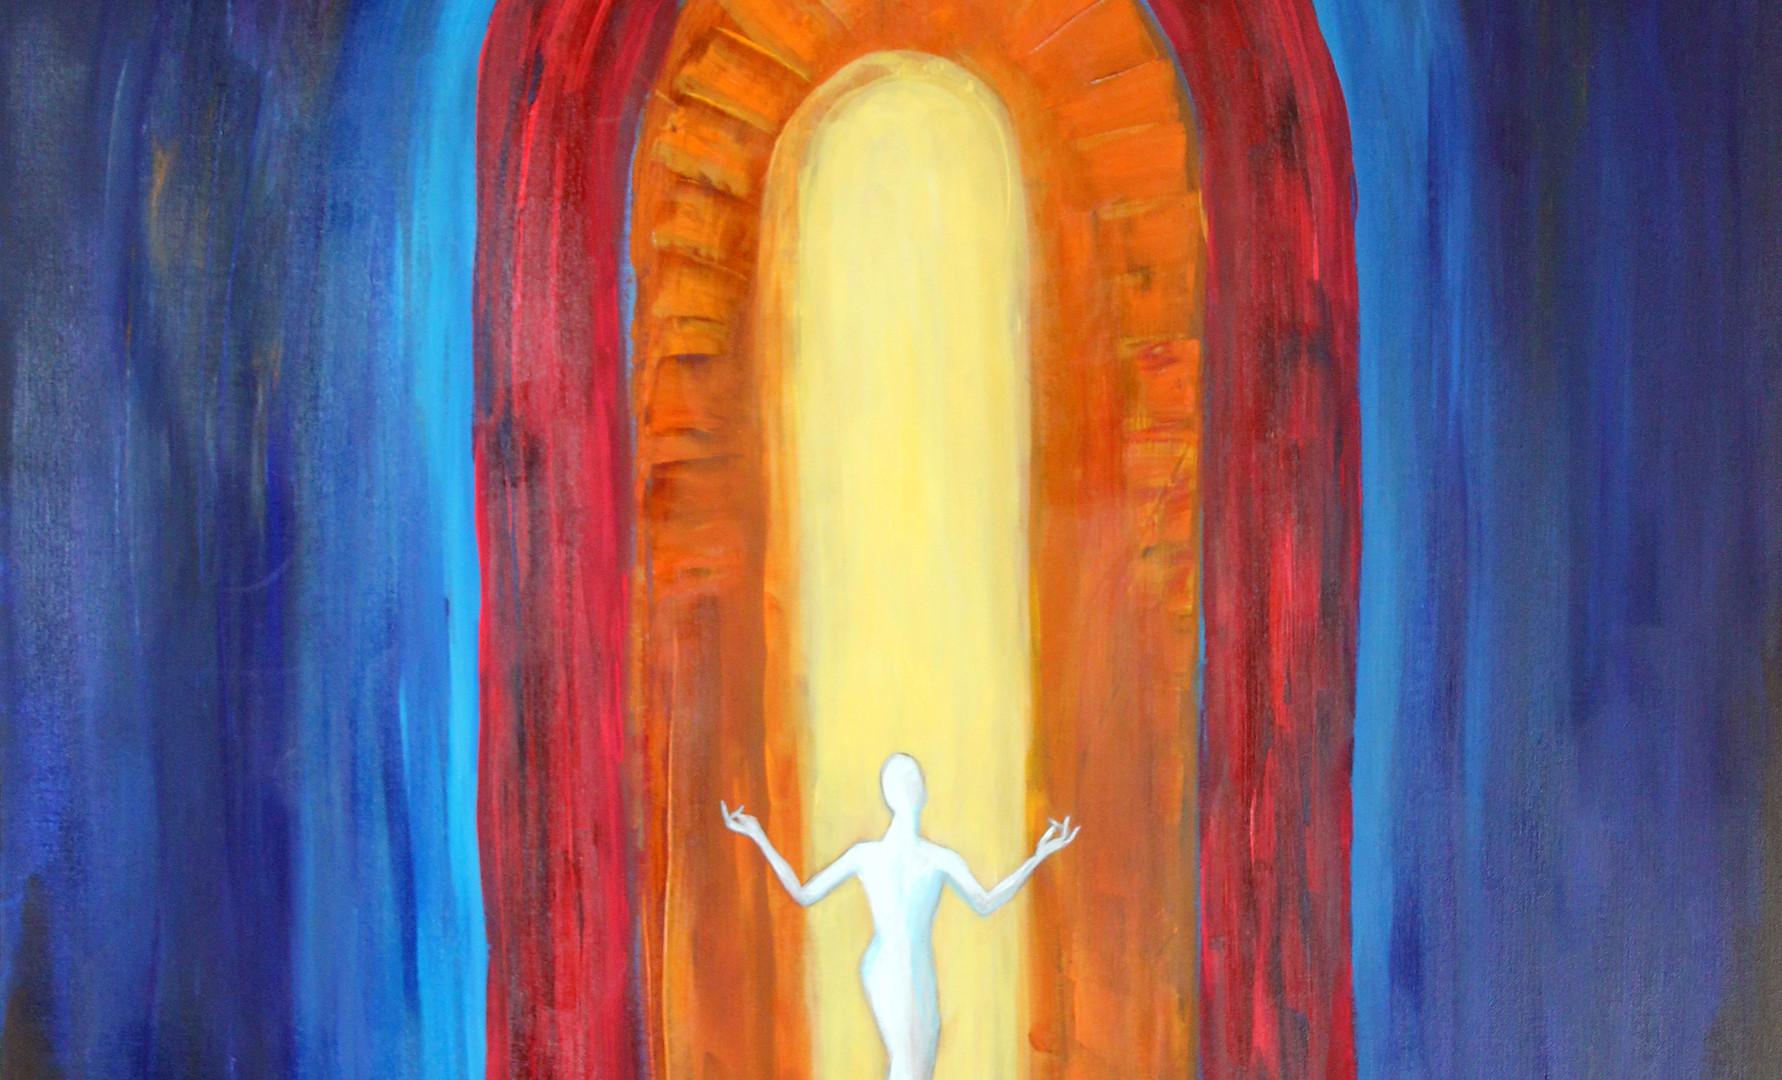 Corridors Of Life